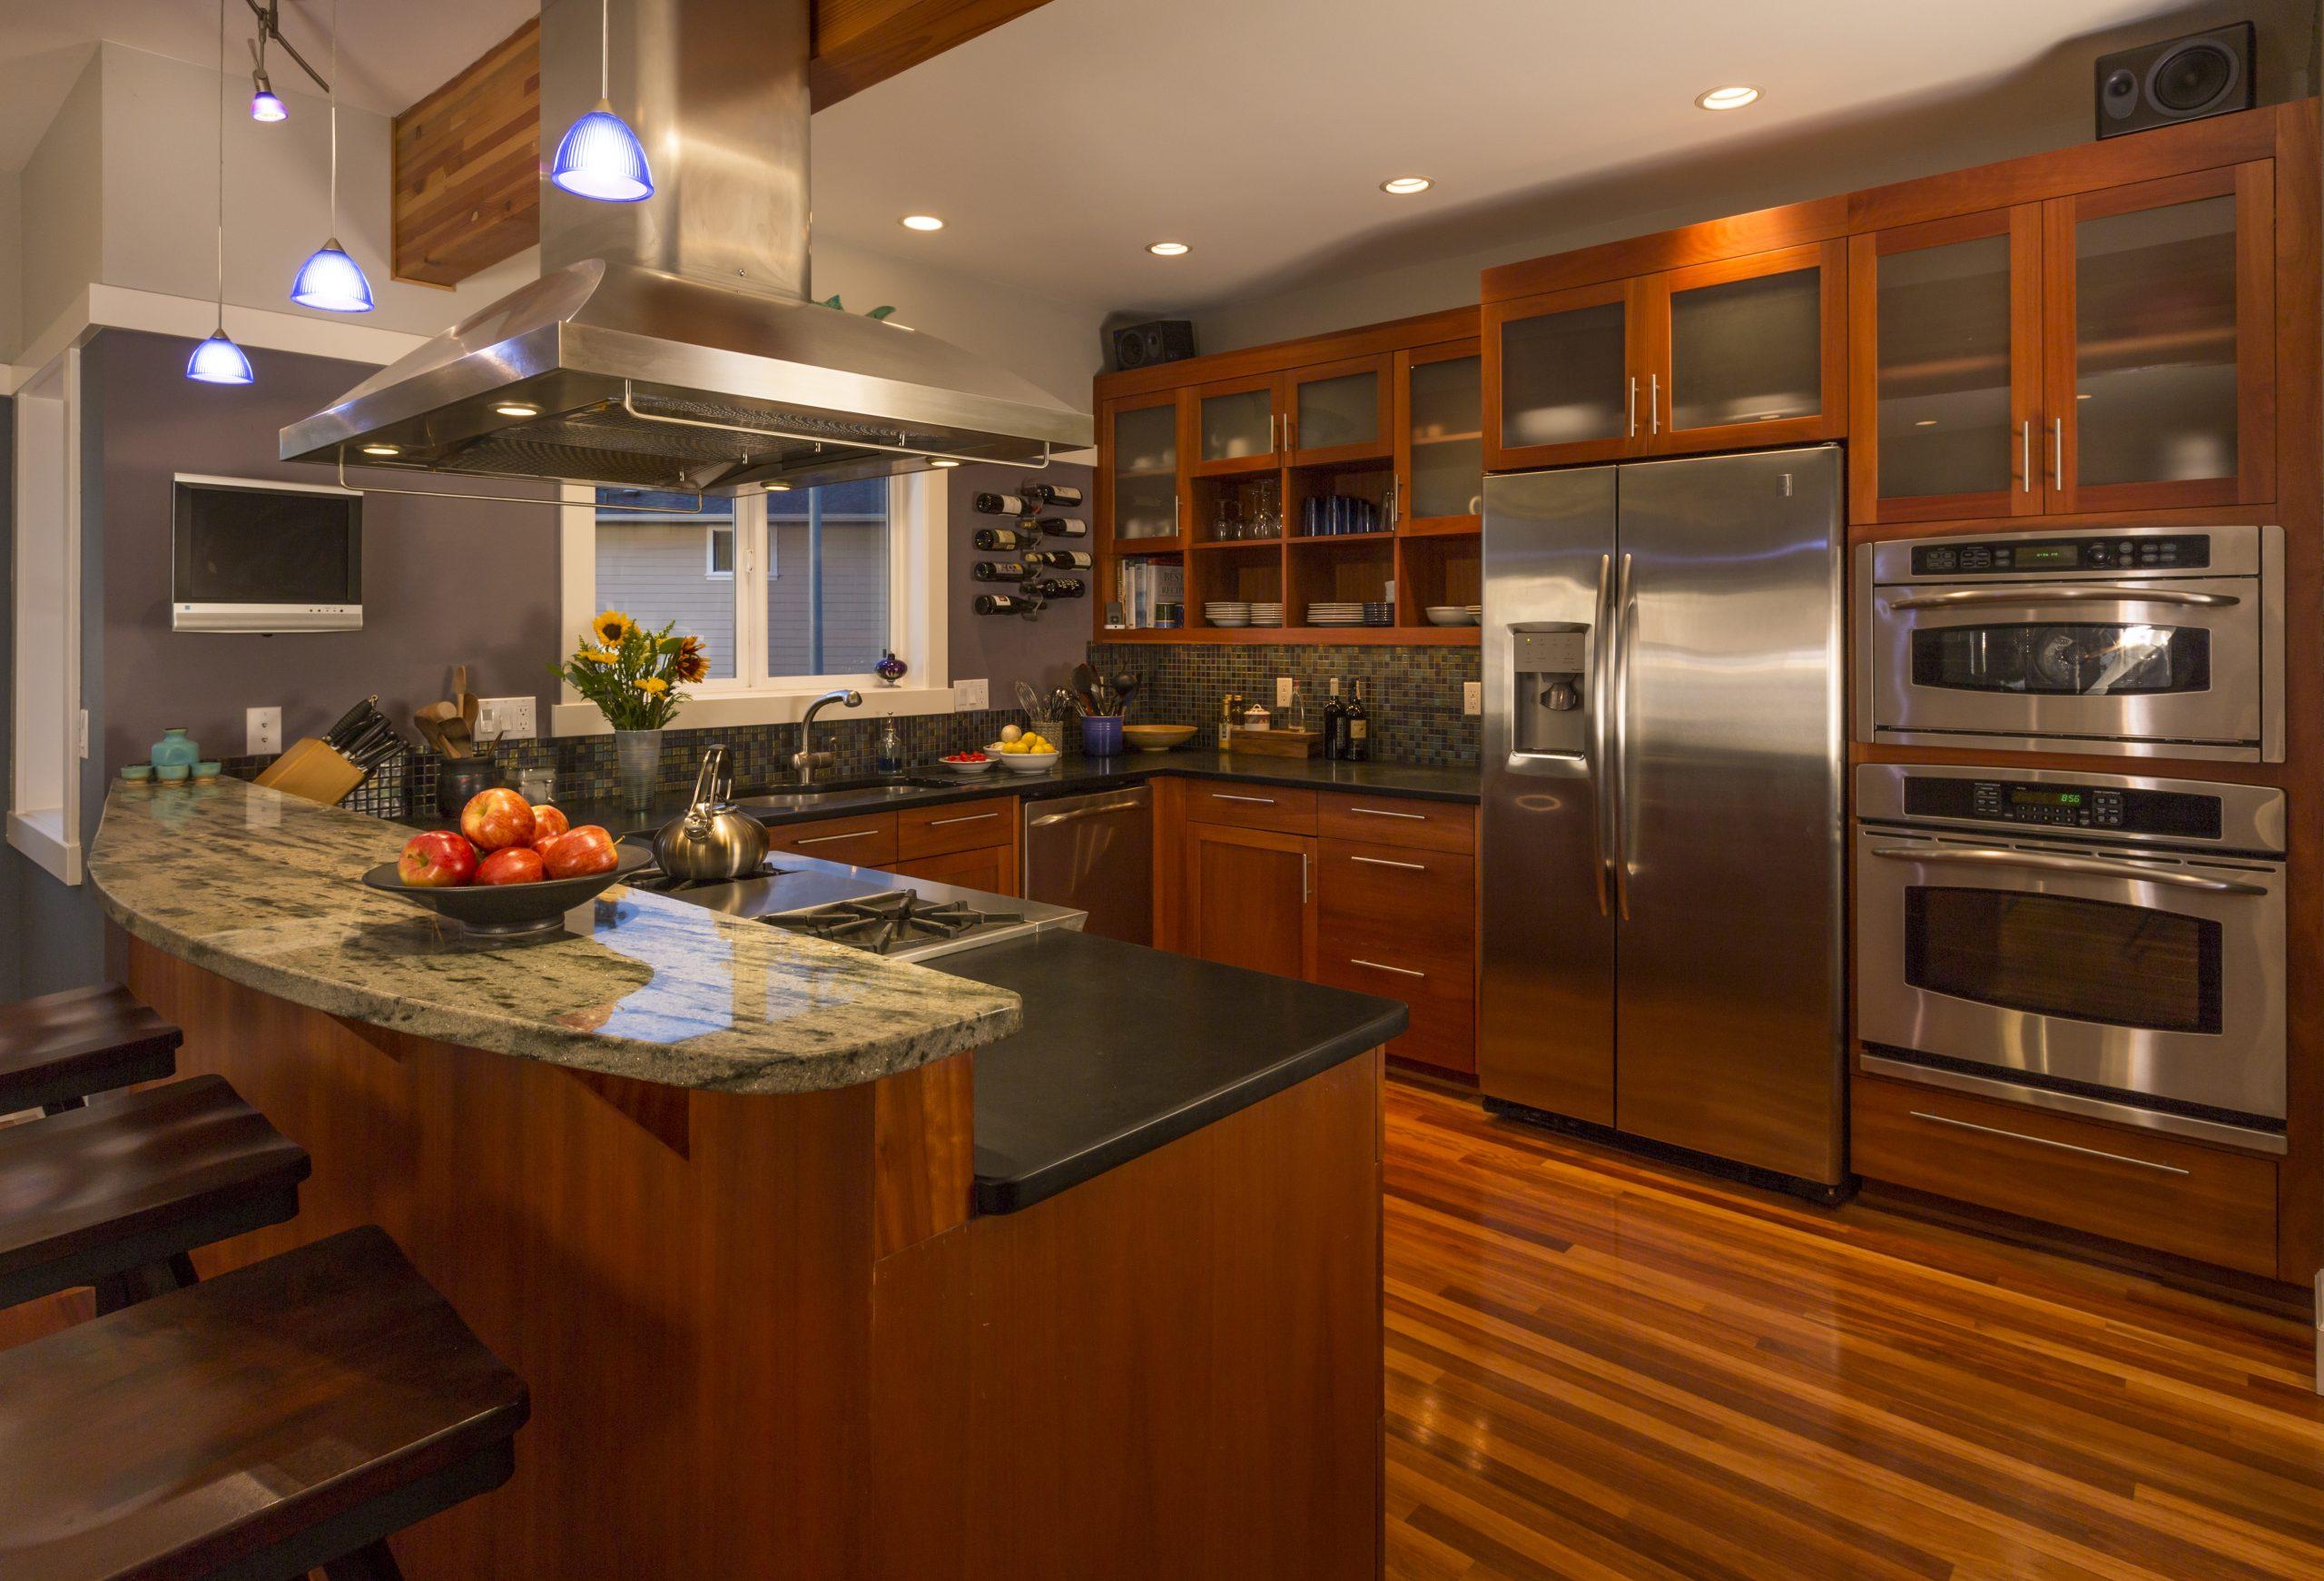 cheap kitchen units for sale